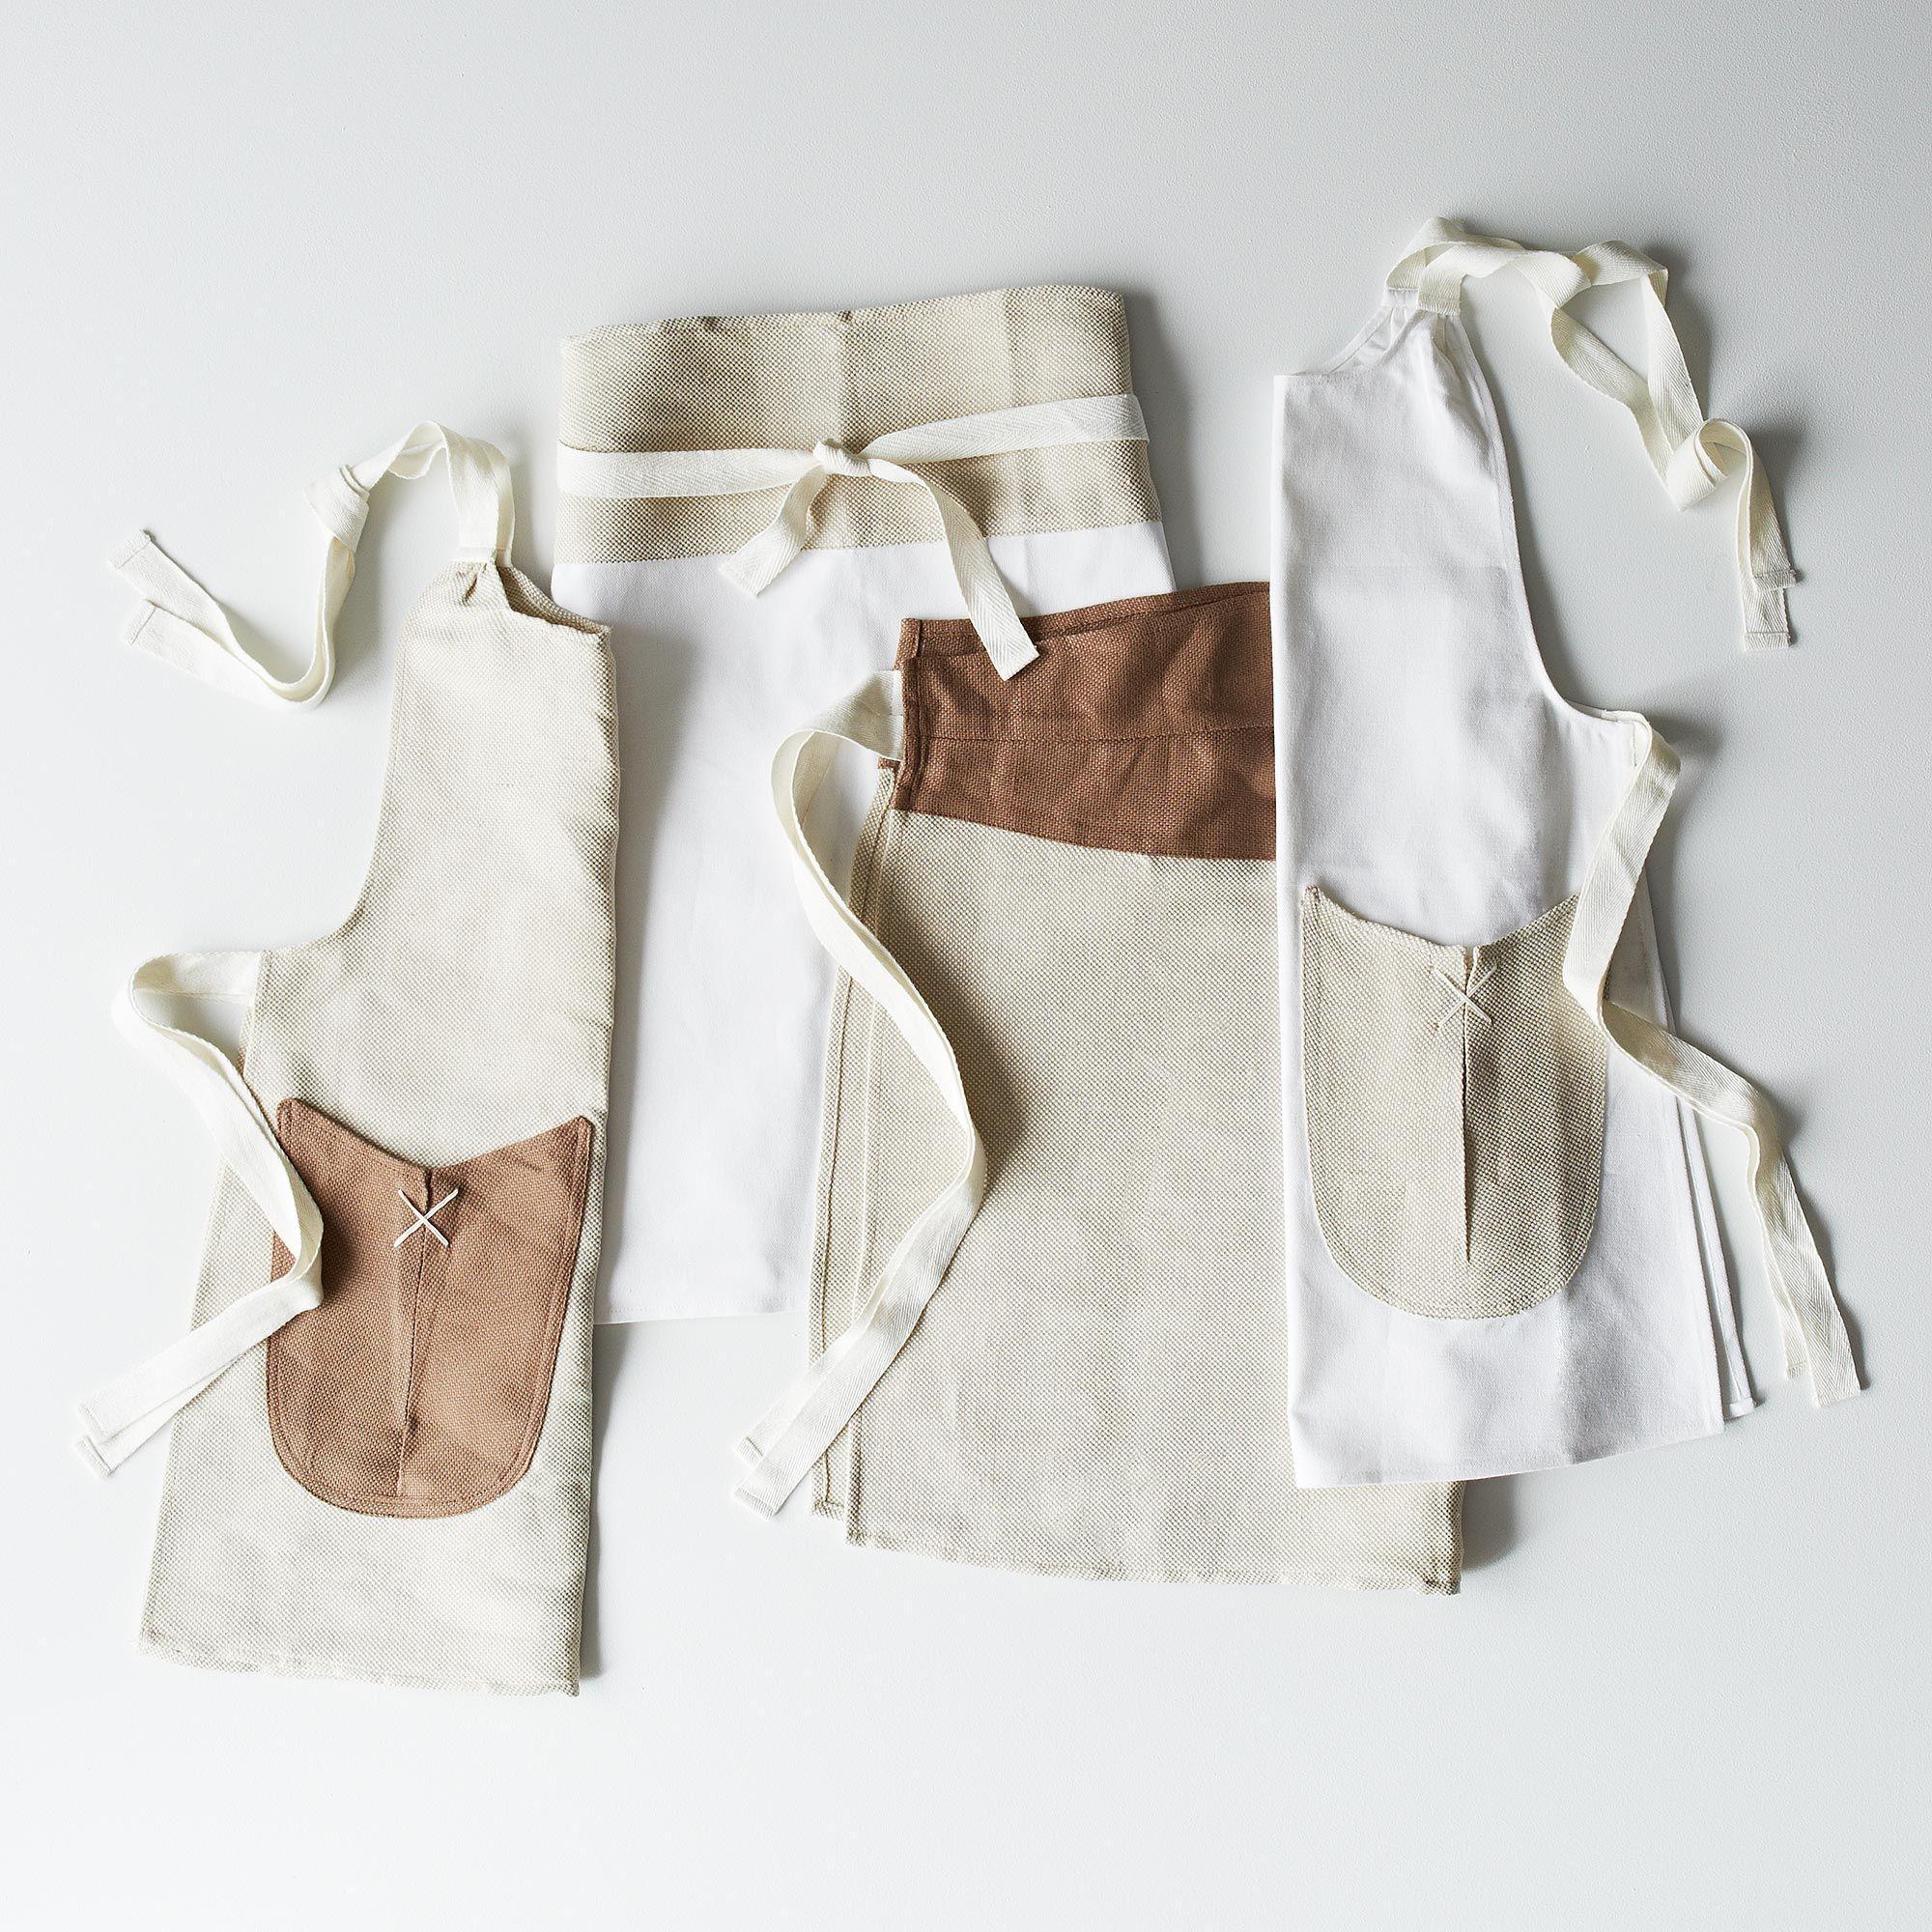 White half apron walmart - Heirloom Children Adult Aprons